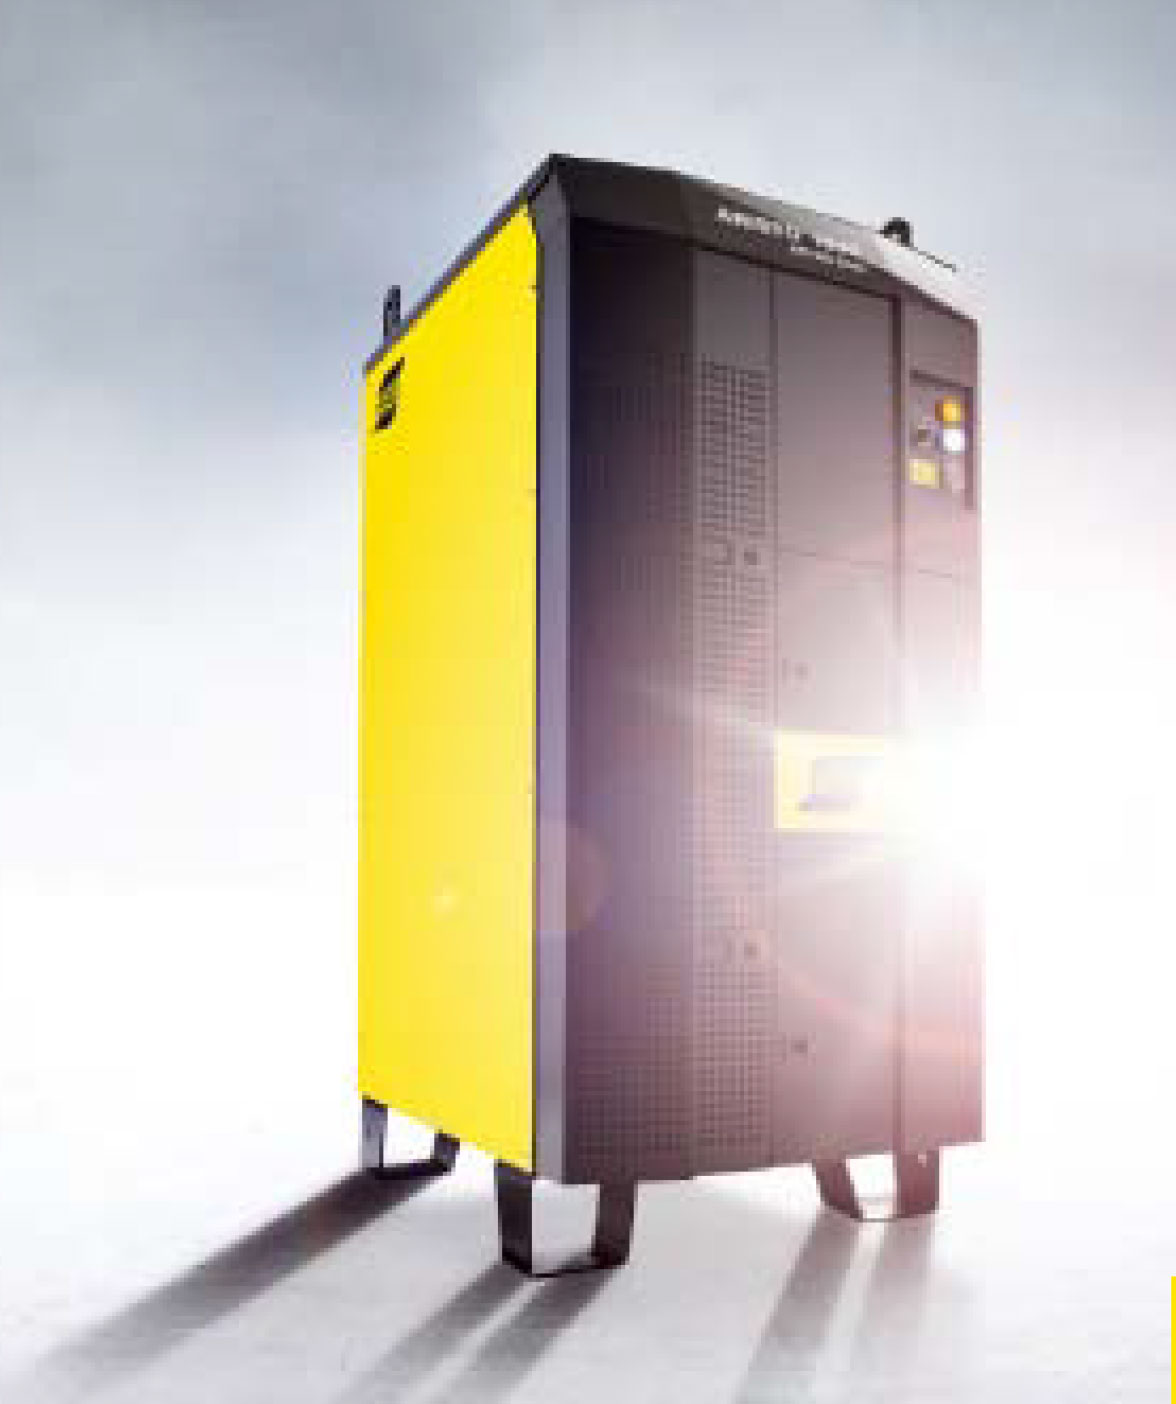 Aristo-1000-AC-DC-SAW-power-source-XA00171020-EN-1